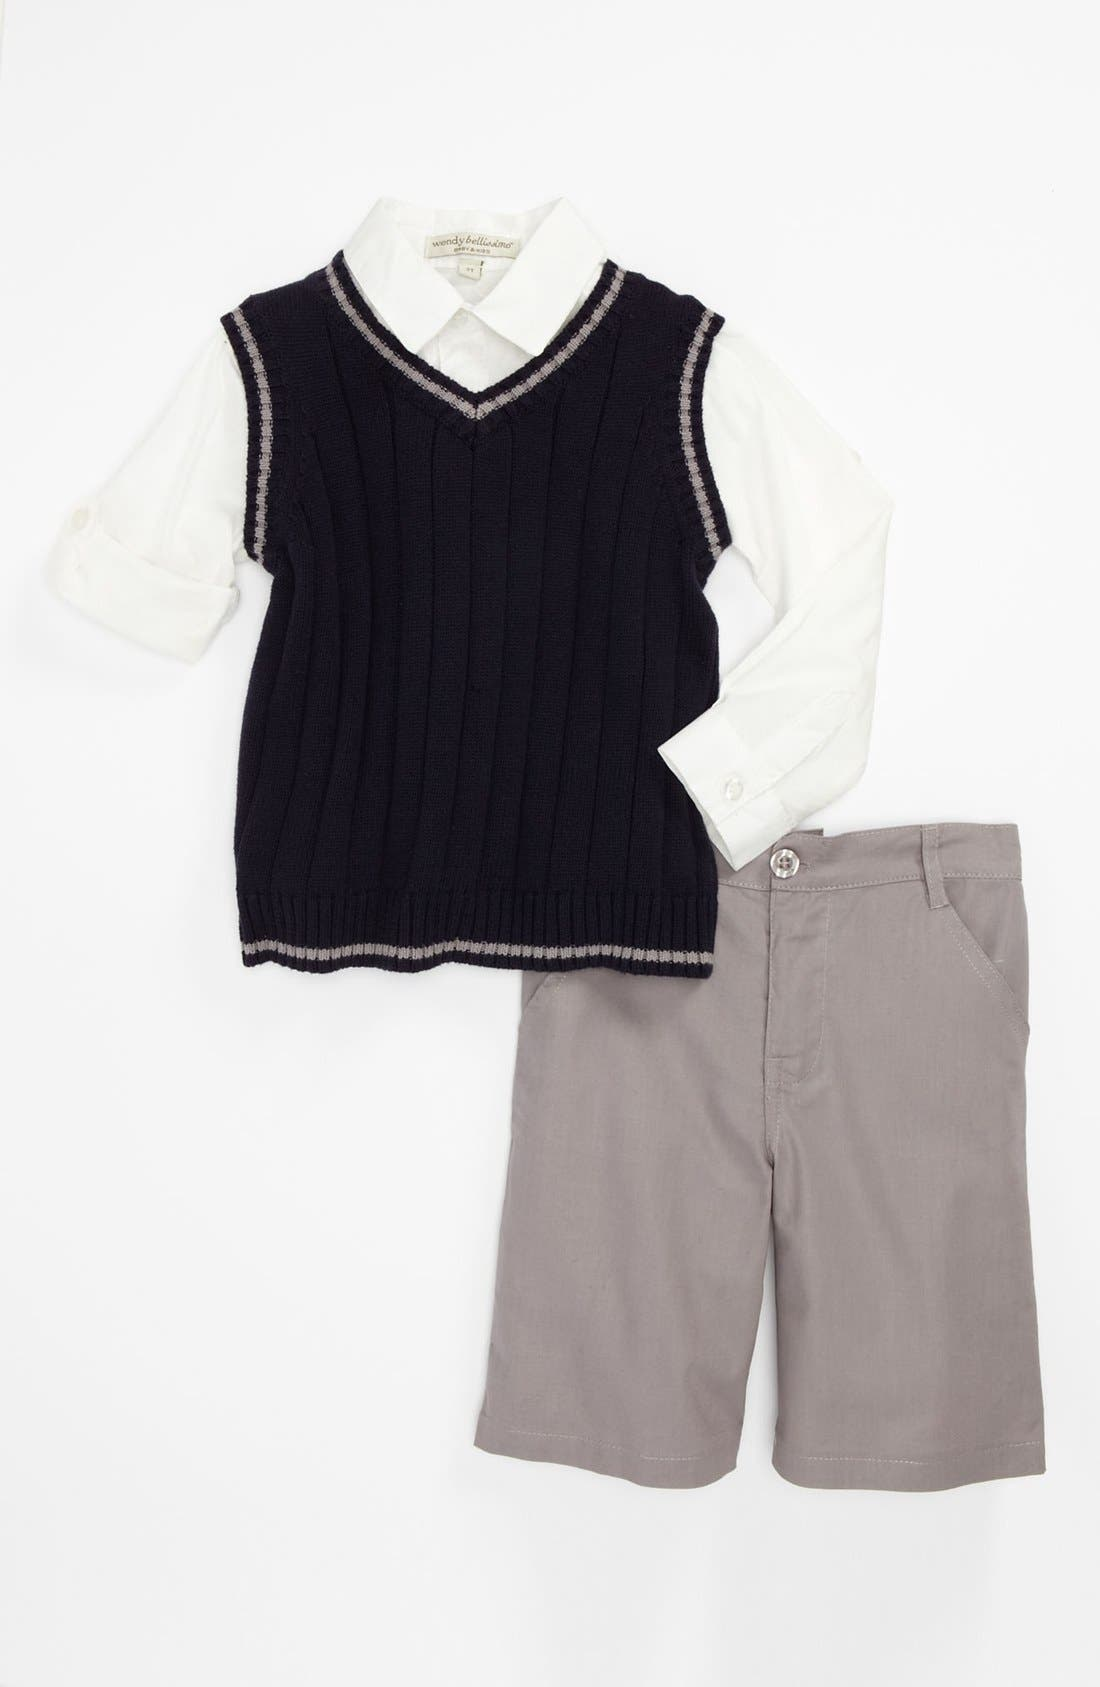 Wendy Bellisimo Sweater Vest, Shirt & Shorts (Toddler) | Nordstrom